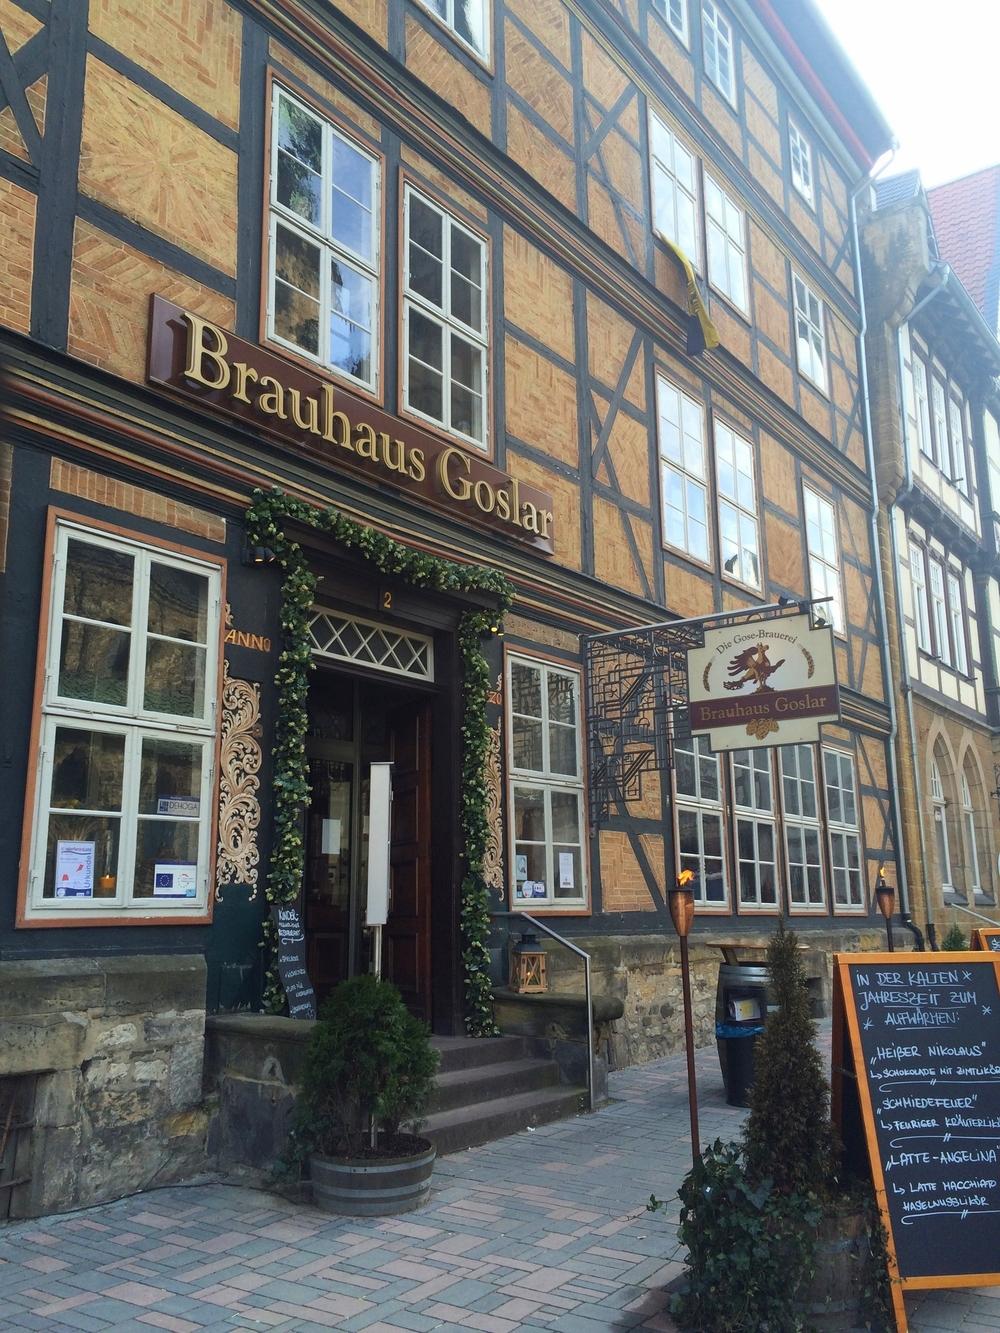 Brauhaus Goslar.JPG